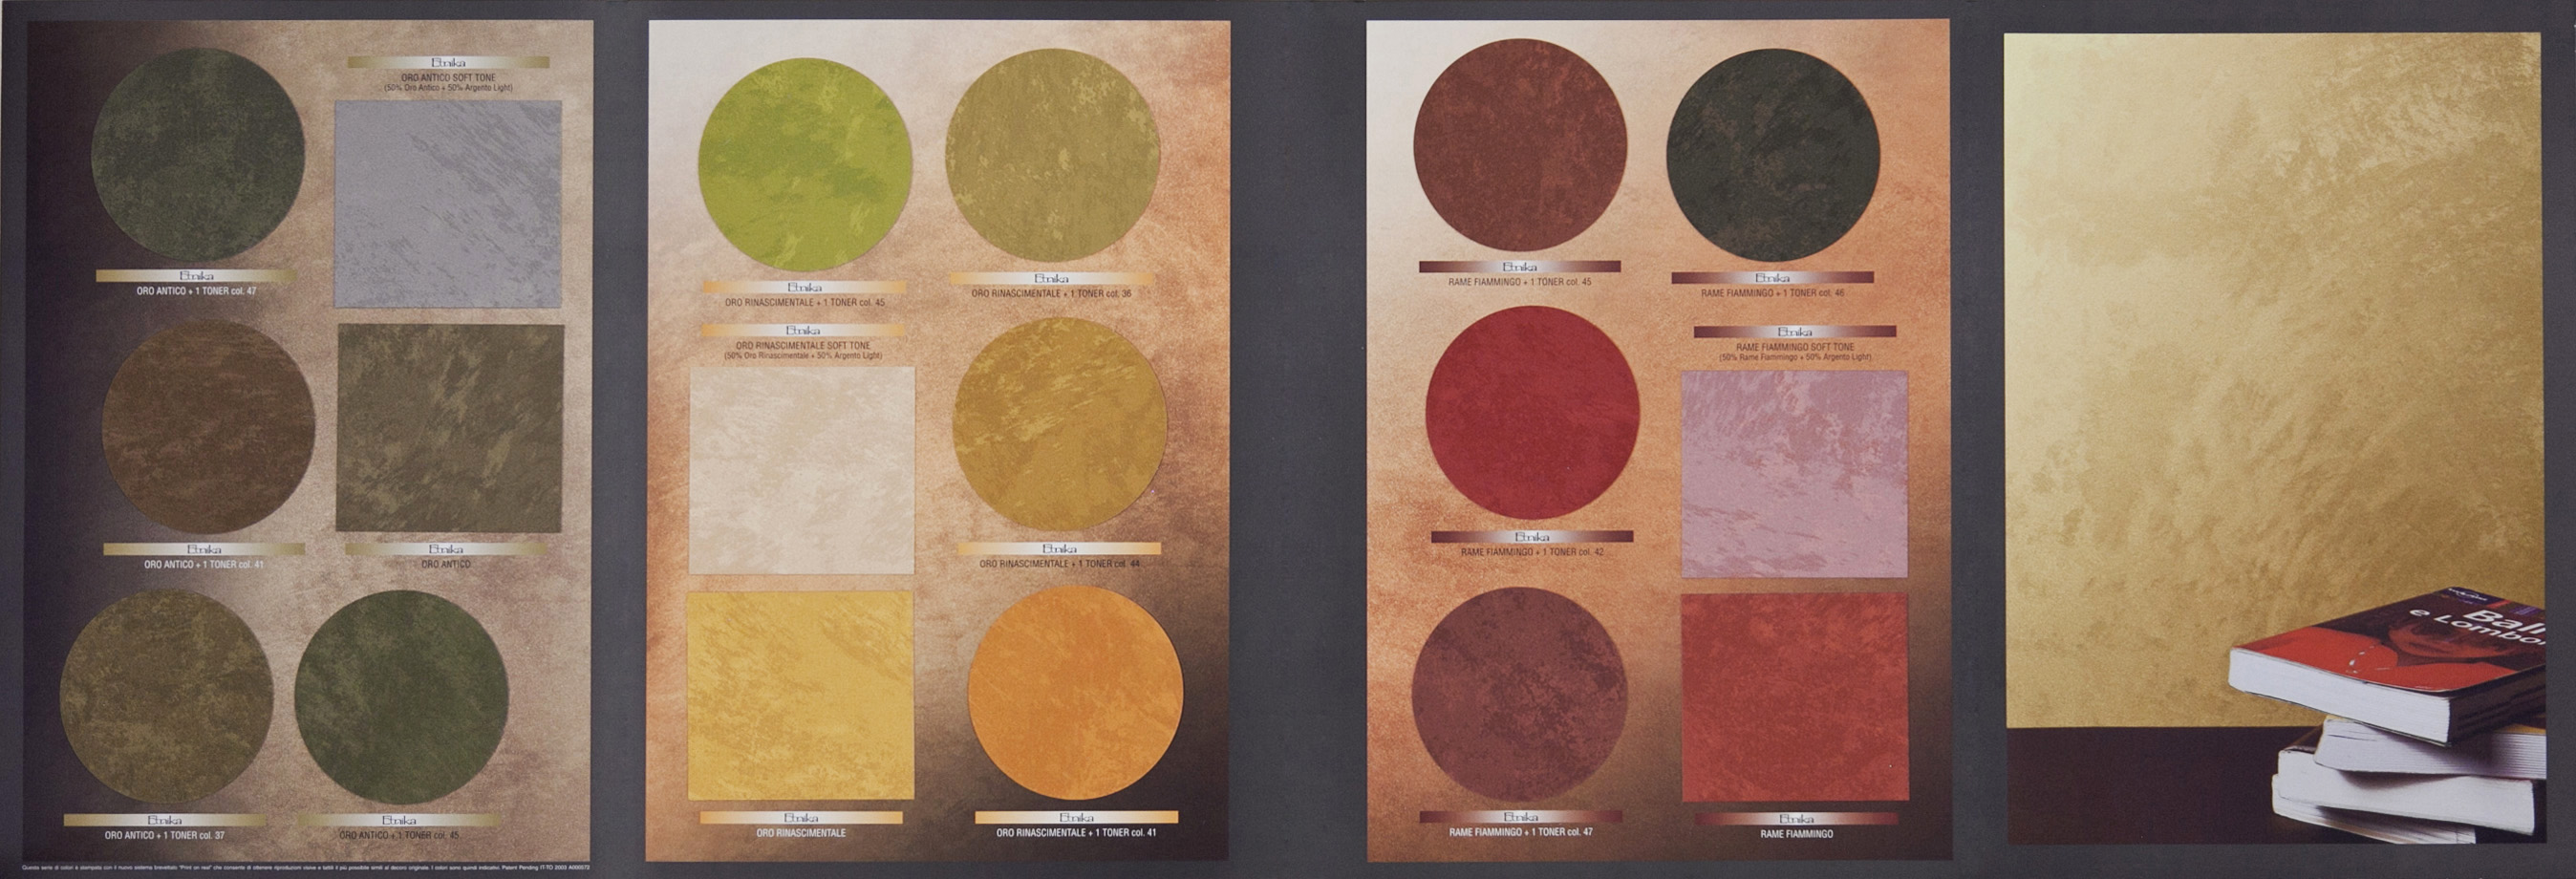 Fabulous candis etnika with tabella colori per pareti interne for Tabella colori per pareti interne